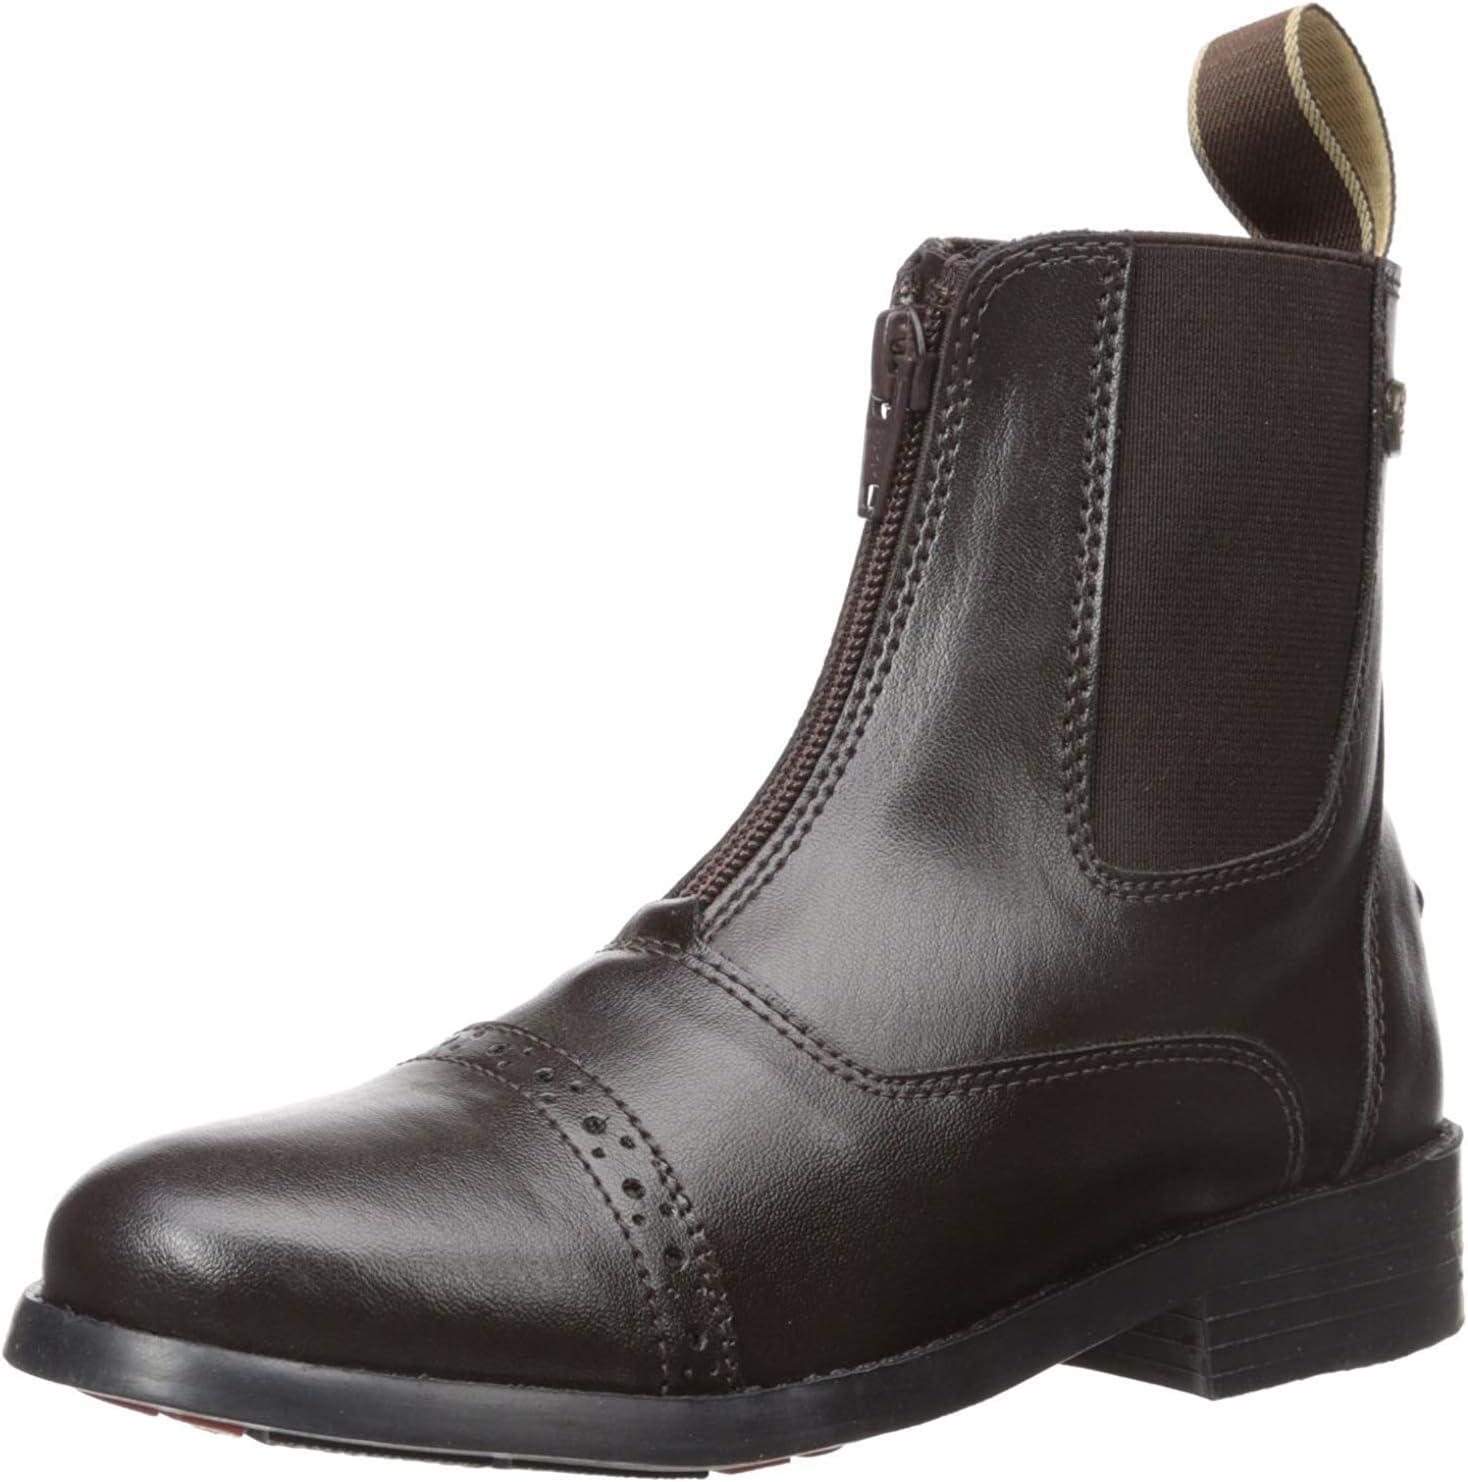 Equistar - Child's Zip Paddock Boot (All Weather) 4 Brown